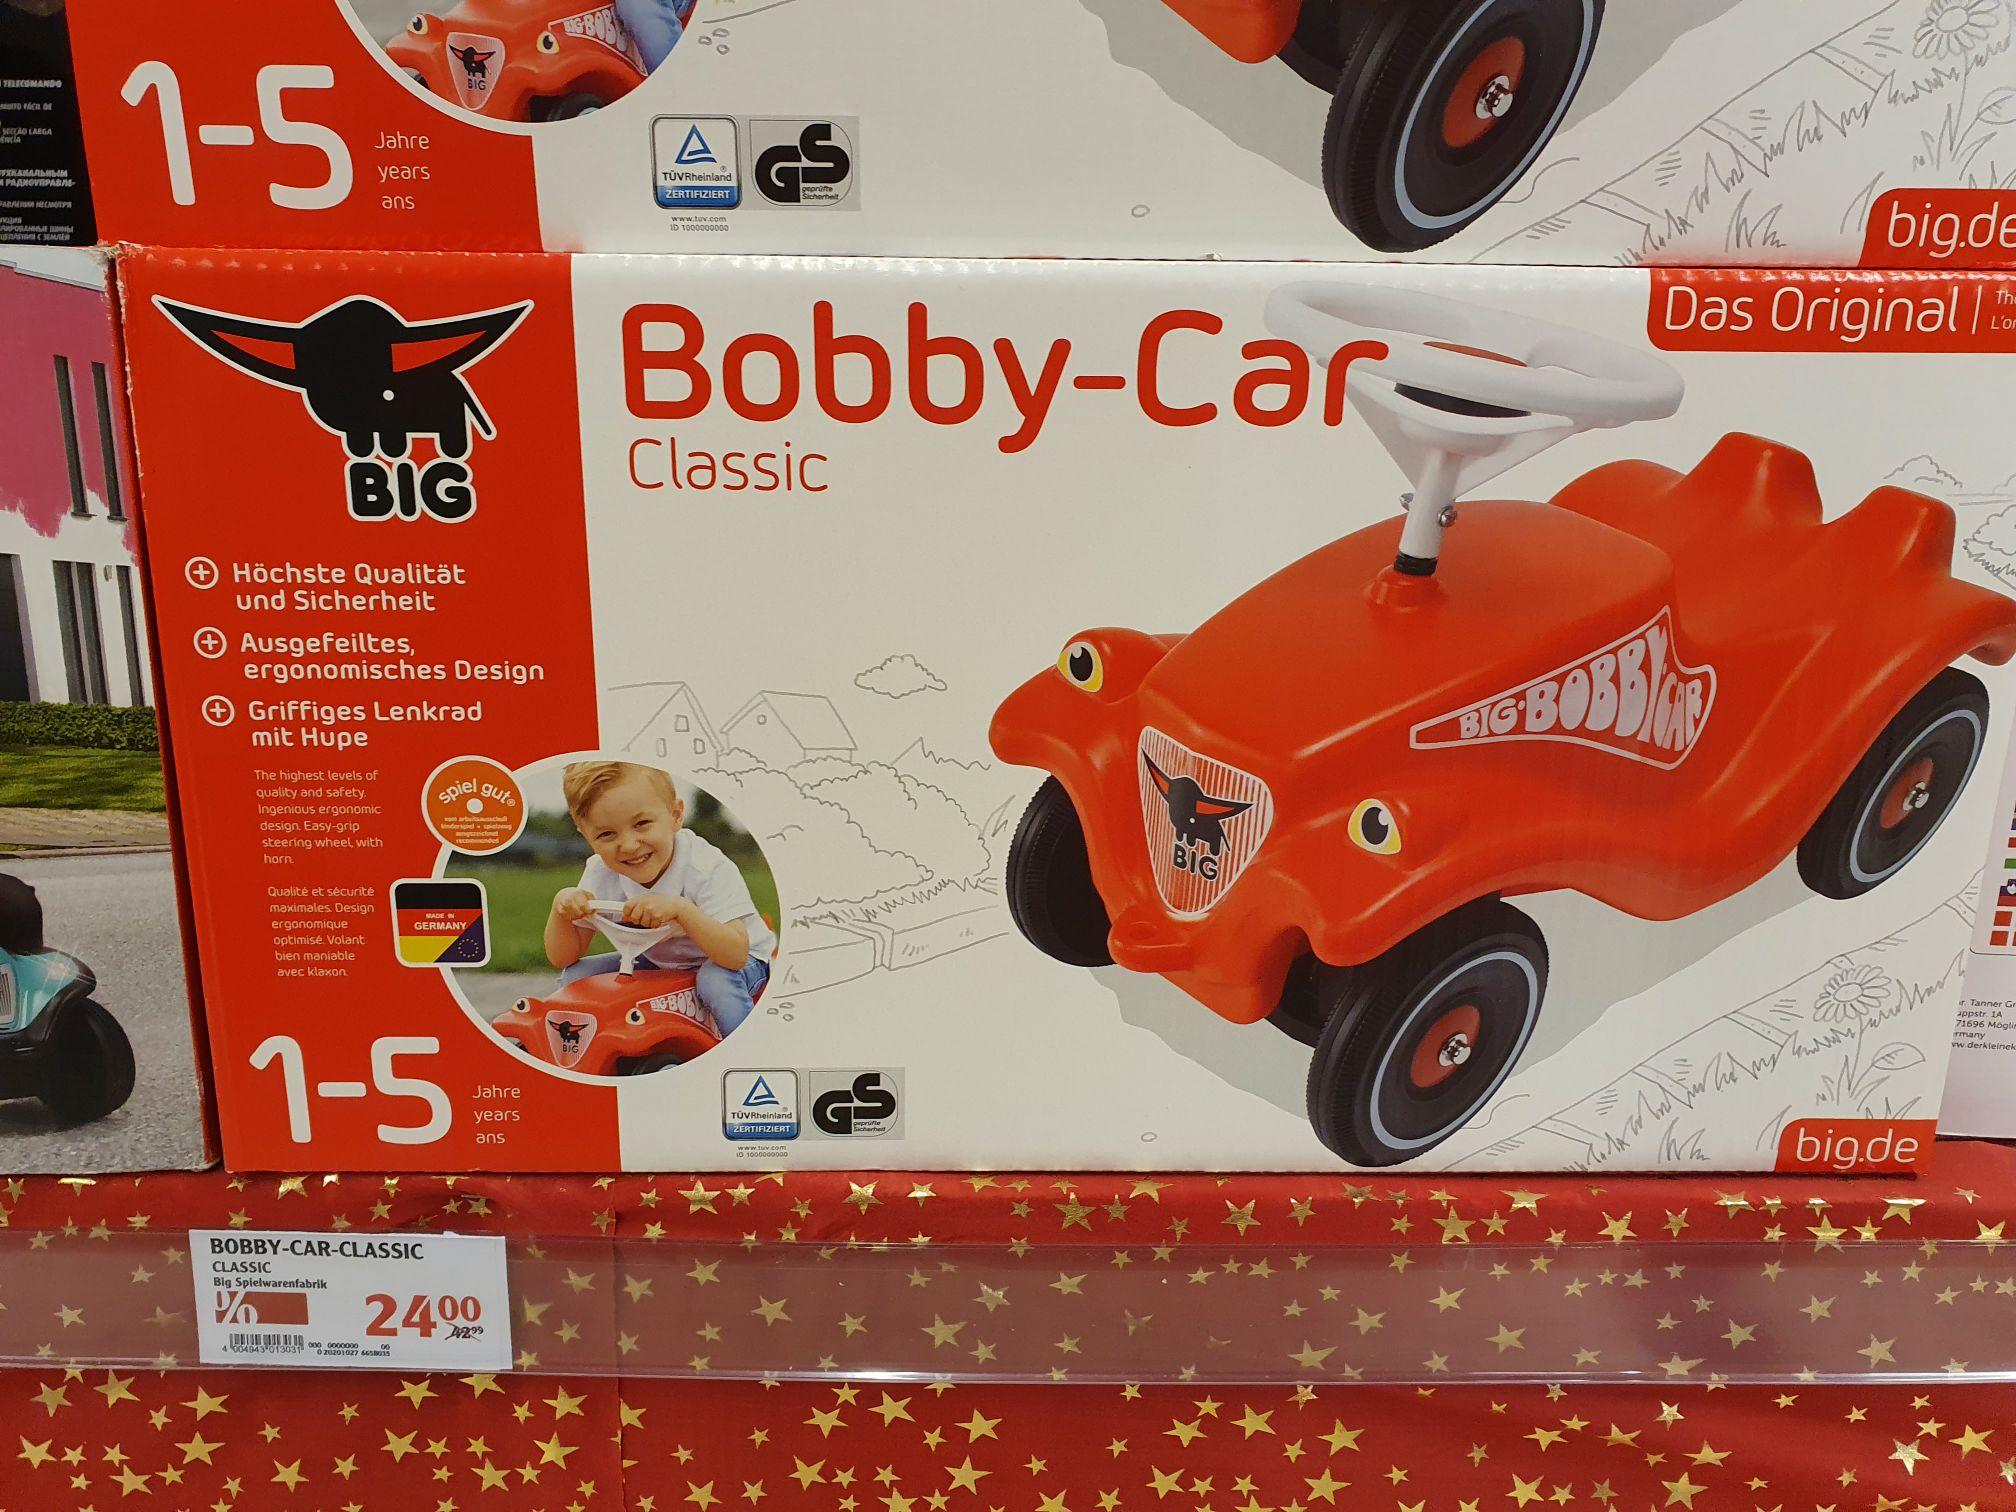 Big Bobby Car Classic (Globus Hockenheim)